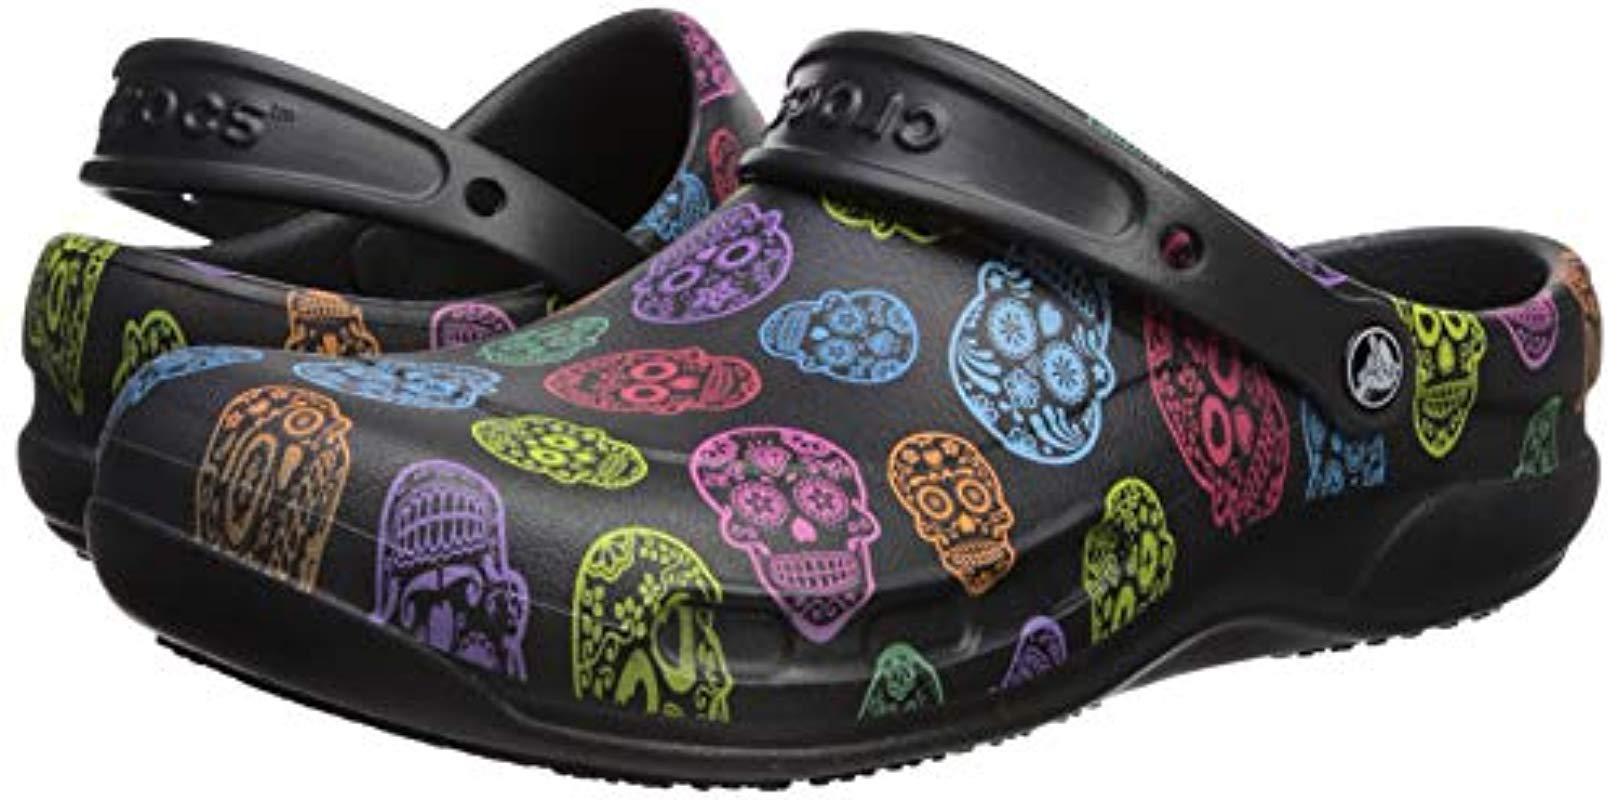 5f791cfc8844 Lyst - Crocs™ And Bistro Graphic Clog